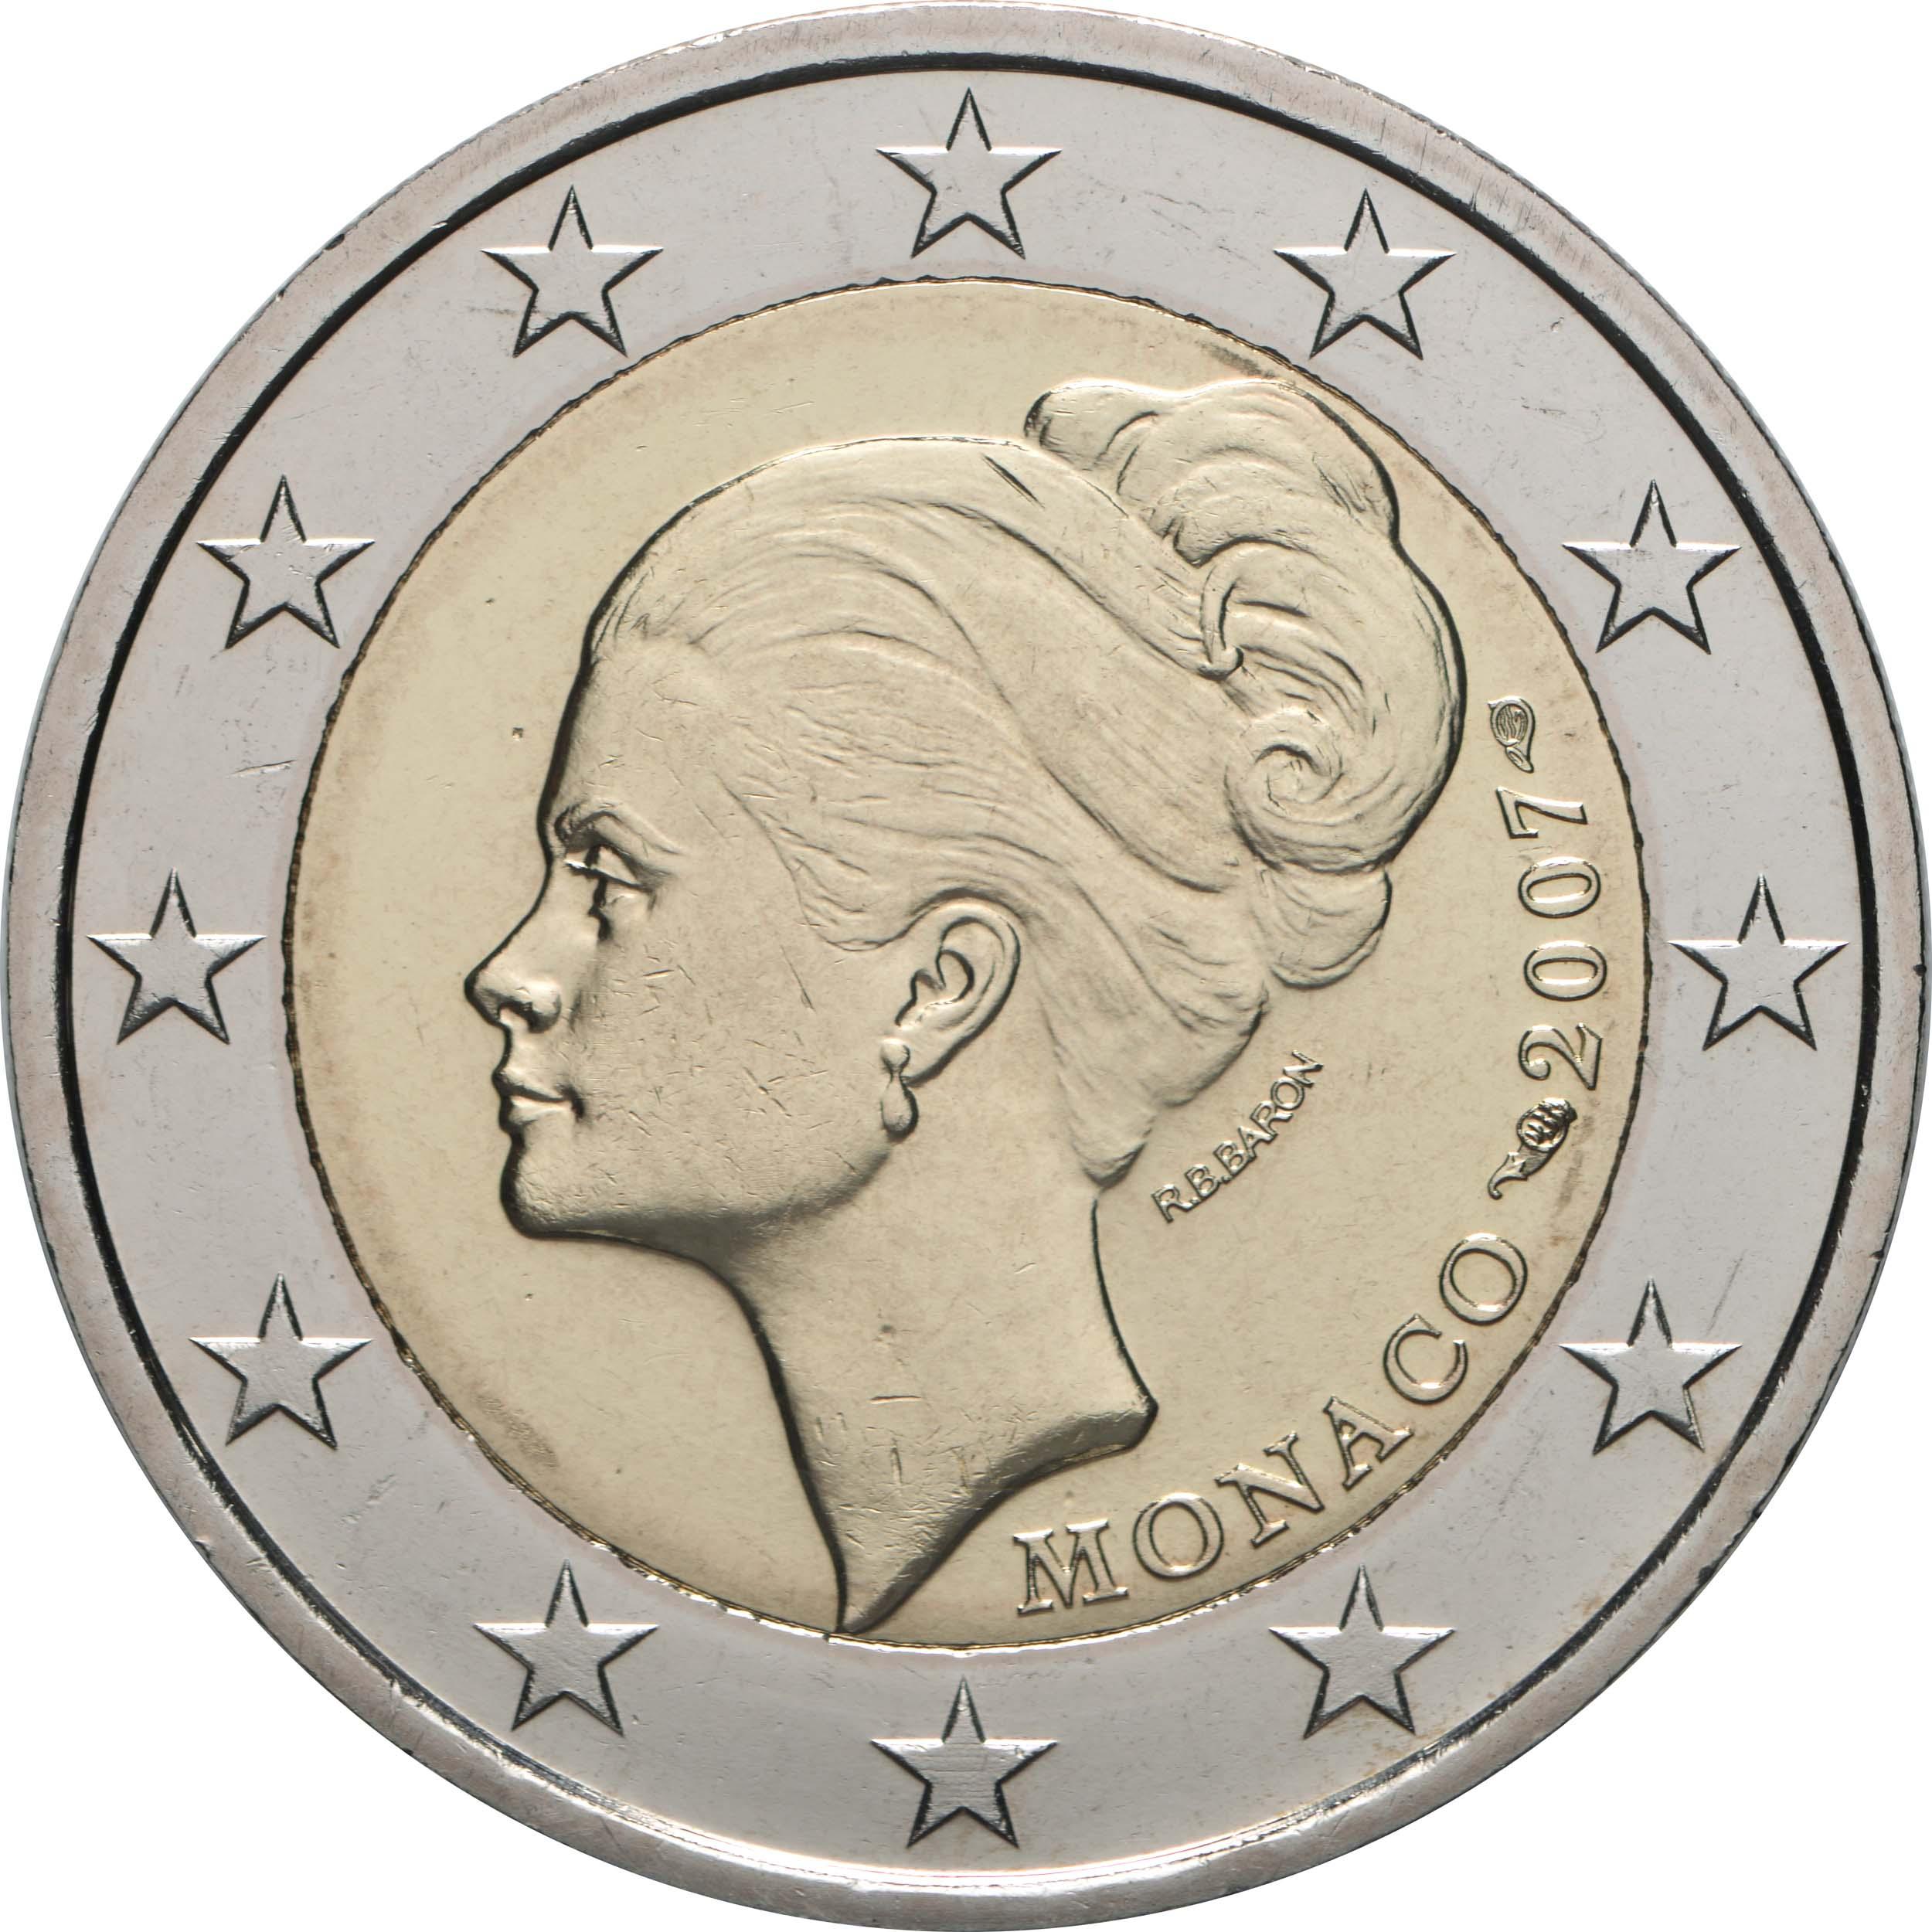 Rückseite :Monaco : 2 Euro Gracia Patrizia / Grace Kelly  2007 bfr 2 Euro Monaco 2007